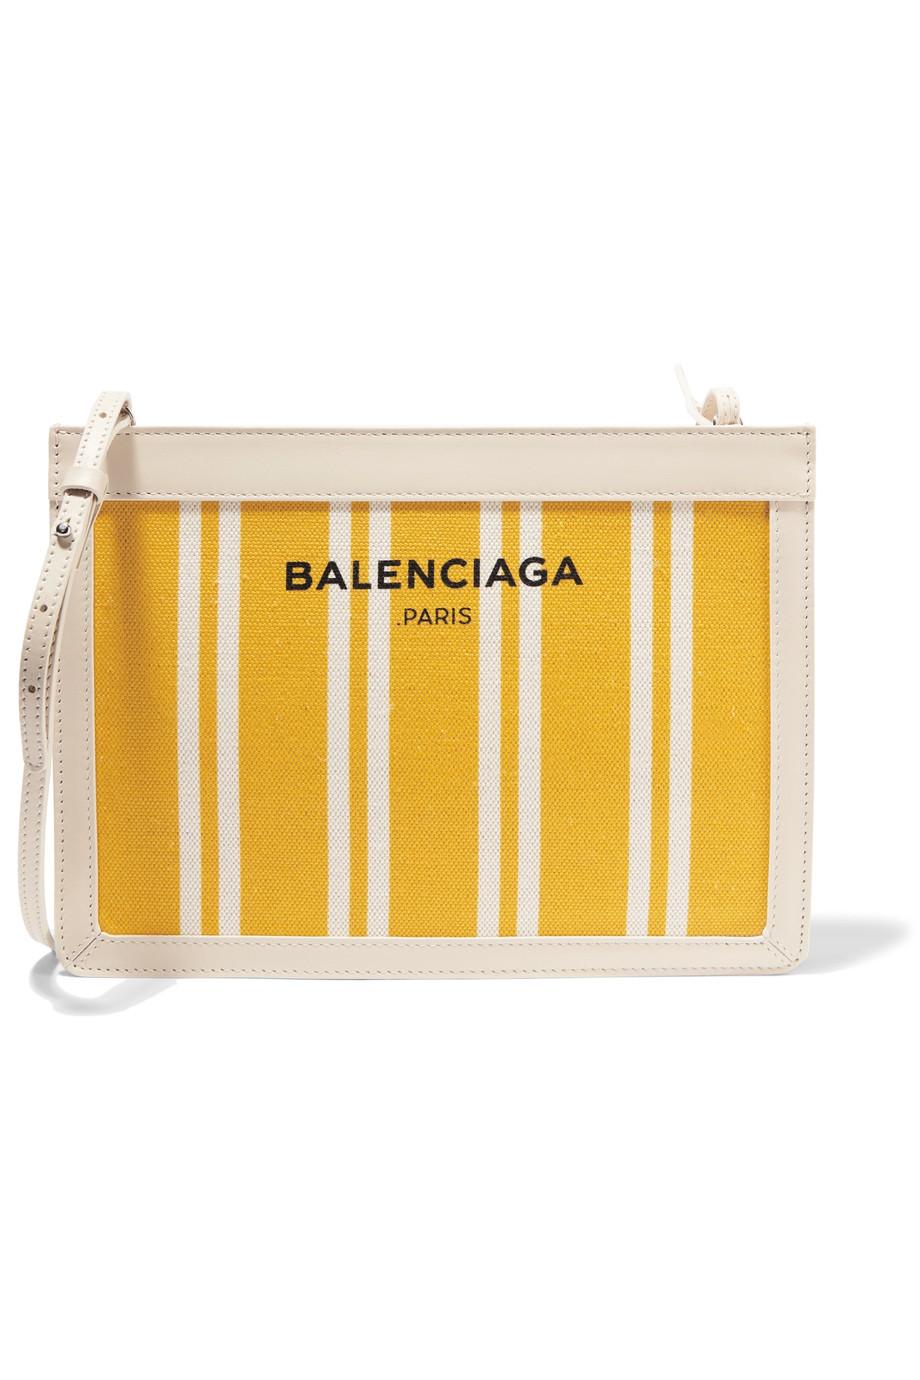 Balenciaga  Leather-Trimmed Striped Canvas Bag  ($755)